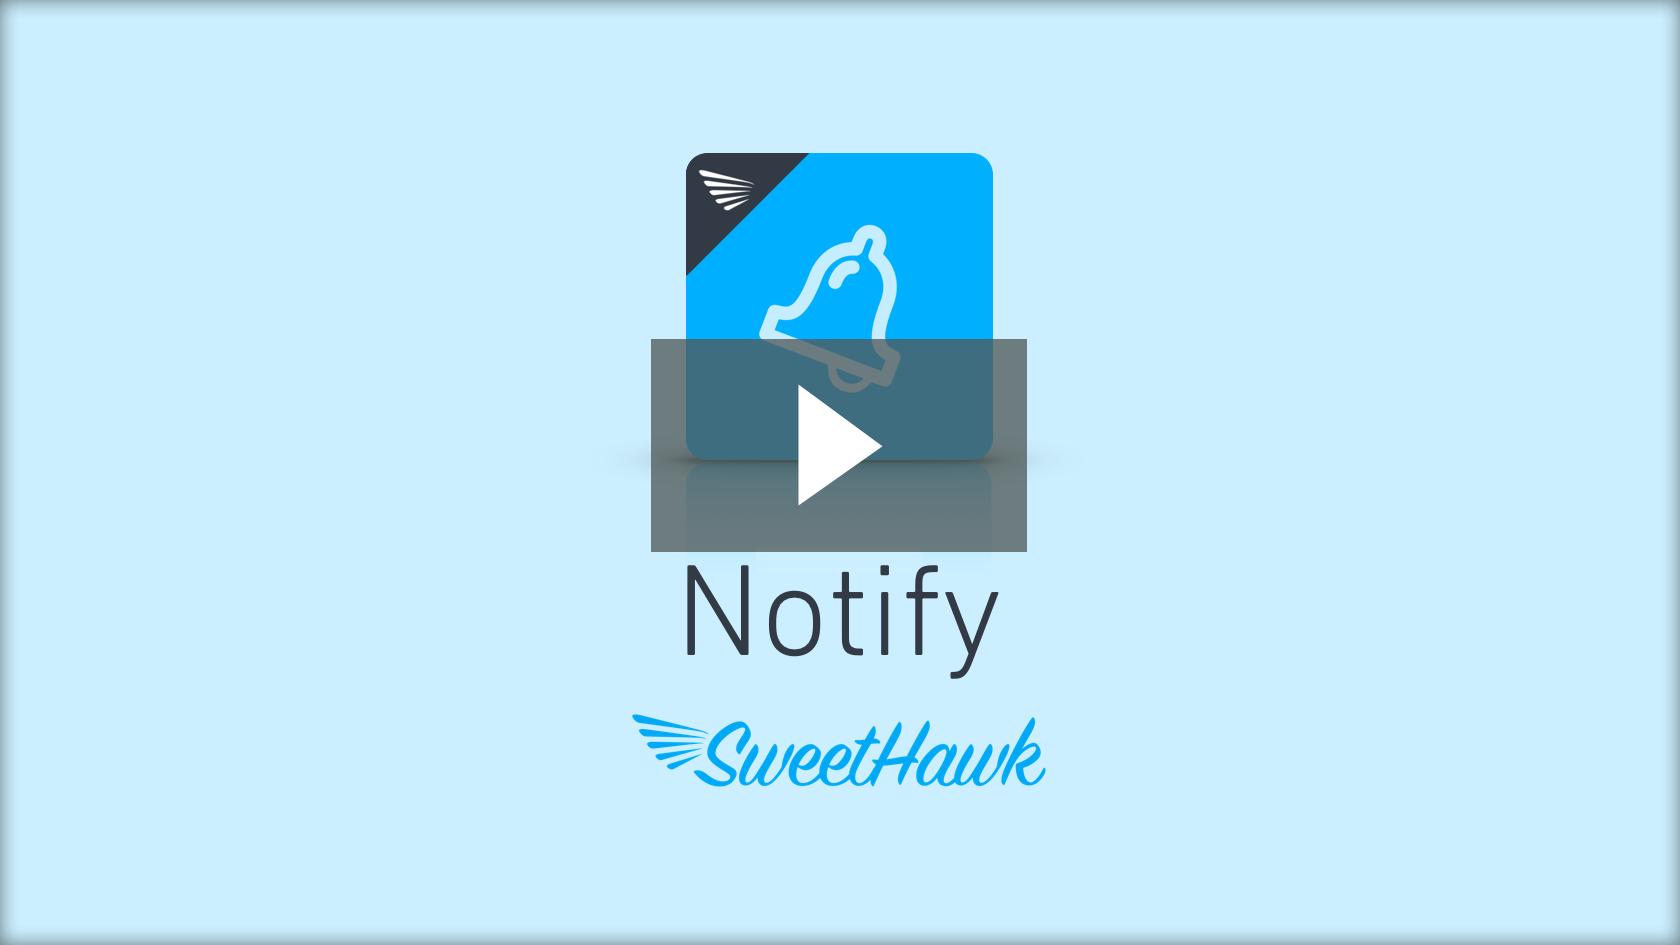 Play Notify video